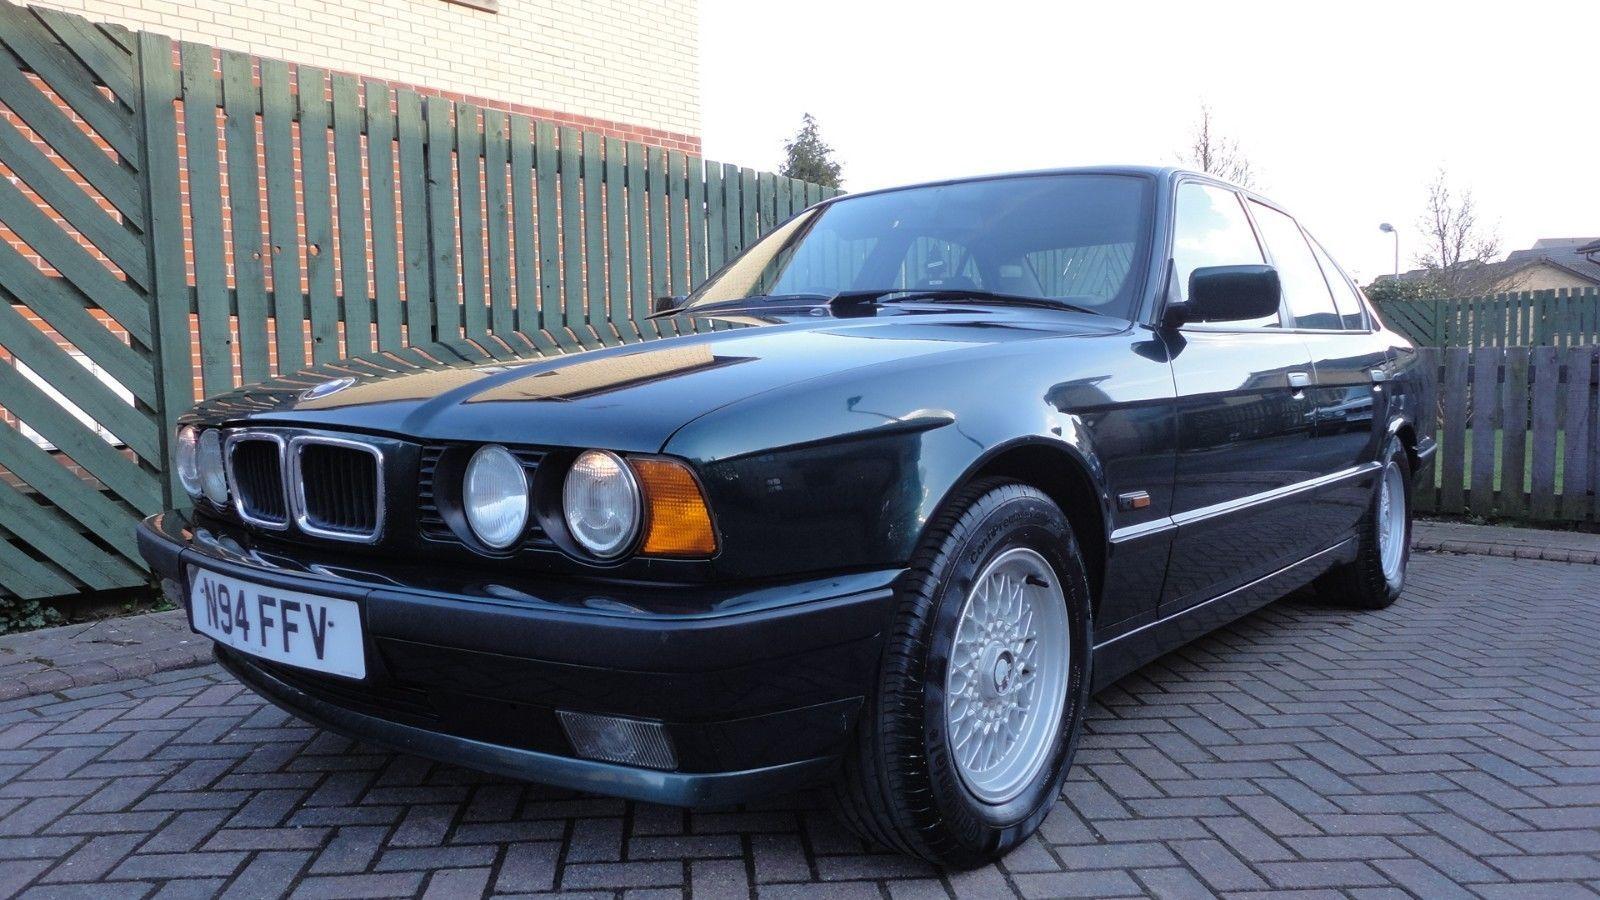 1995 e34 bmw 520i saloon m50 engine manual appreciating rare rh pinterest co uk 1995 E34 540I 1995 E34 M5